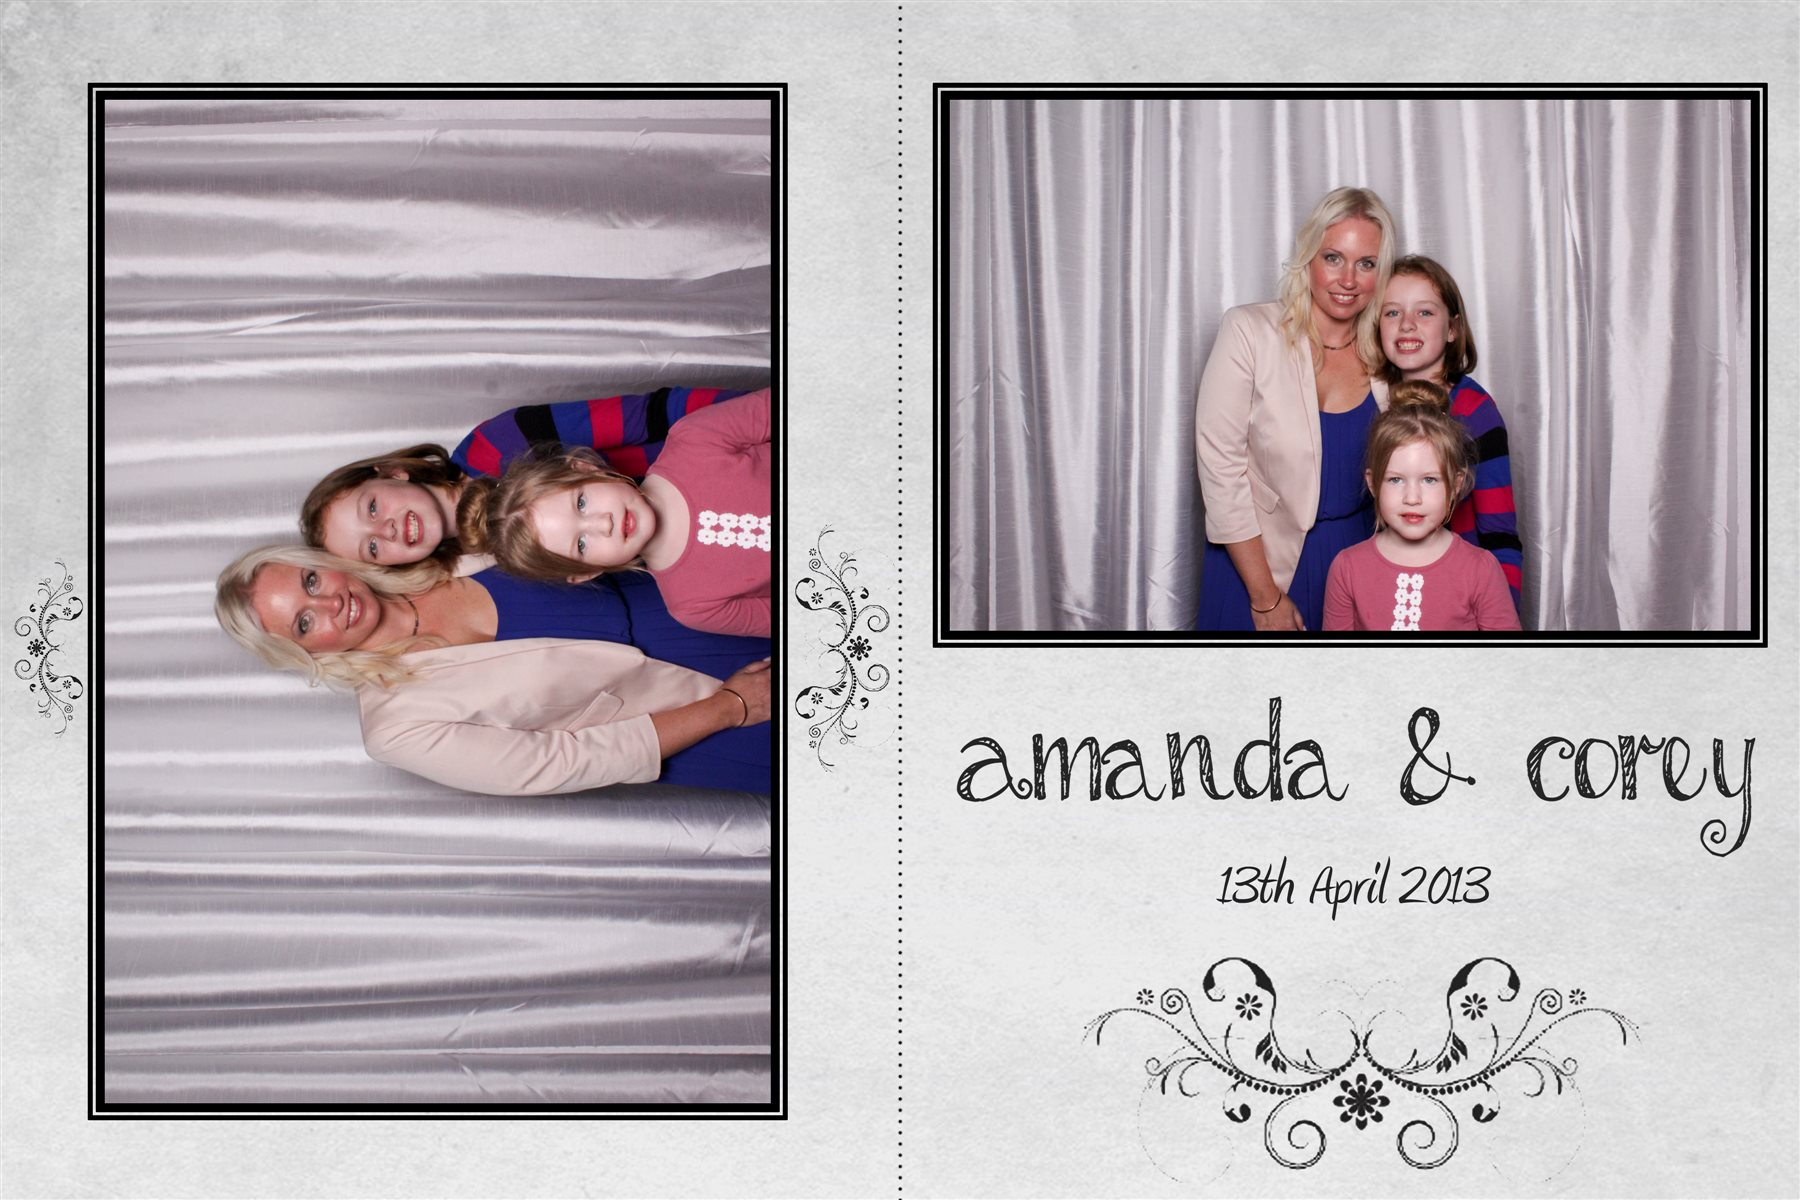 Amanda Booth and Tyler Laneys Wedding Website